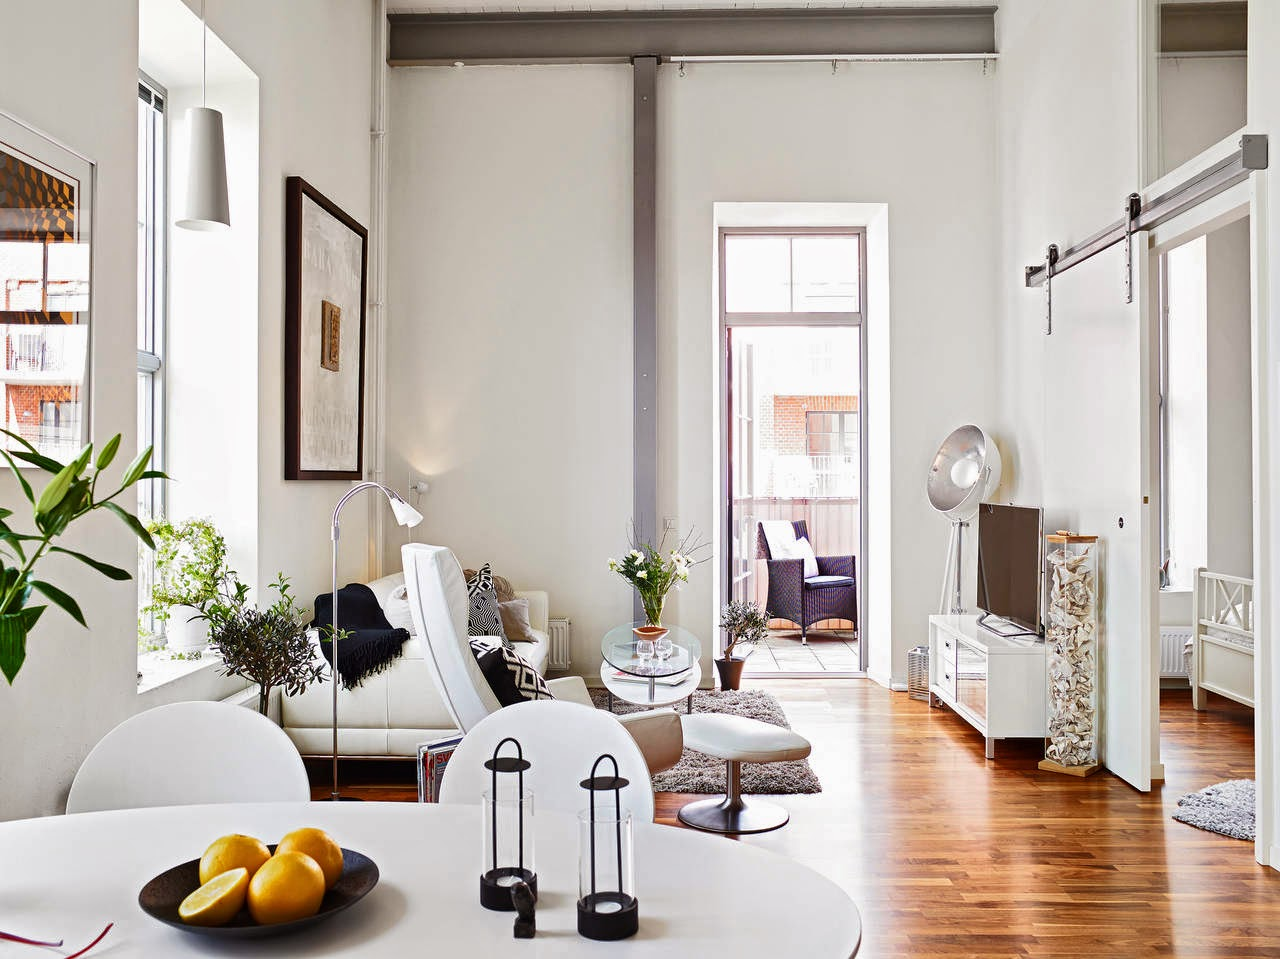 Creative ordinette upcoming decorating projects idee - Idee per casa nuova ...